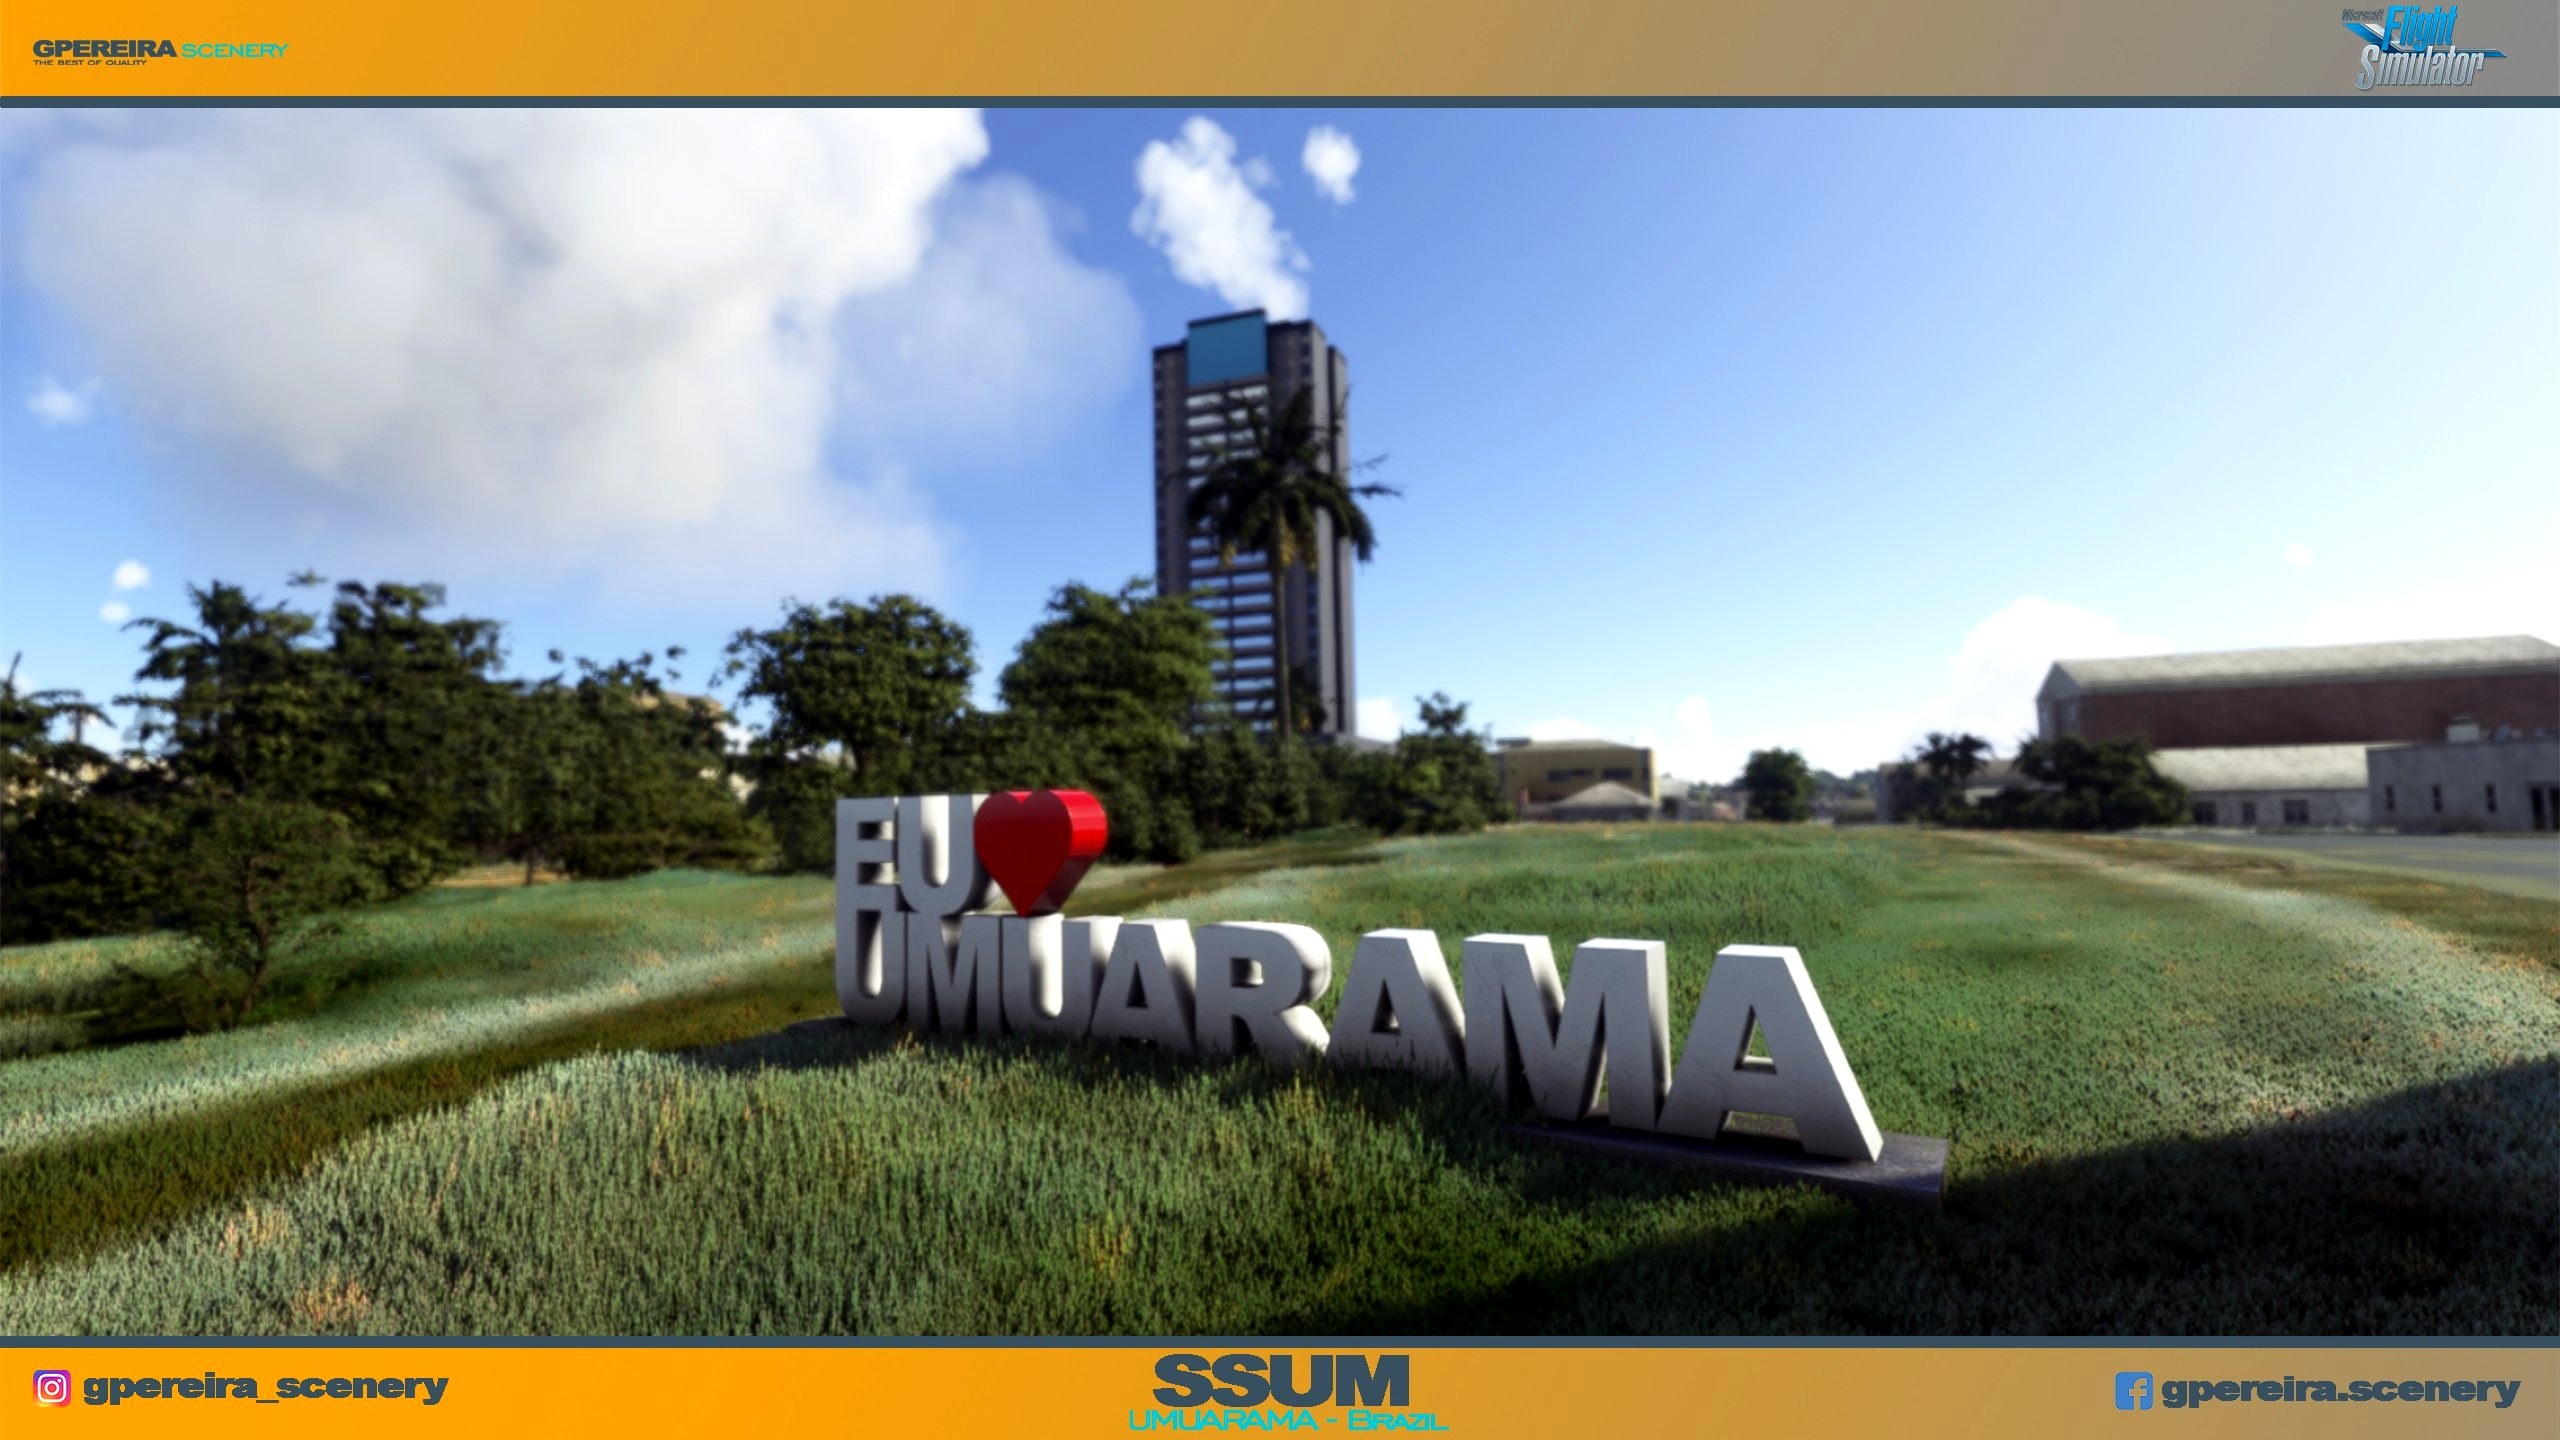 GPEREIRA SCENERY - UMUARAMA - SSUM - BRAZIL - MSFS